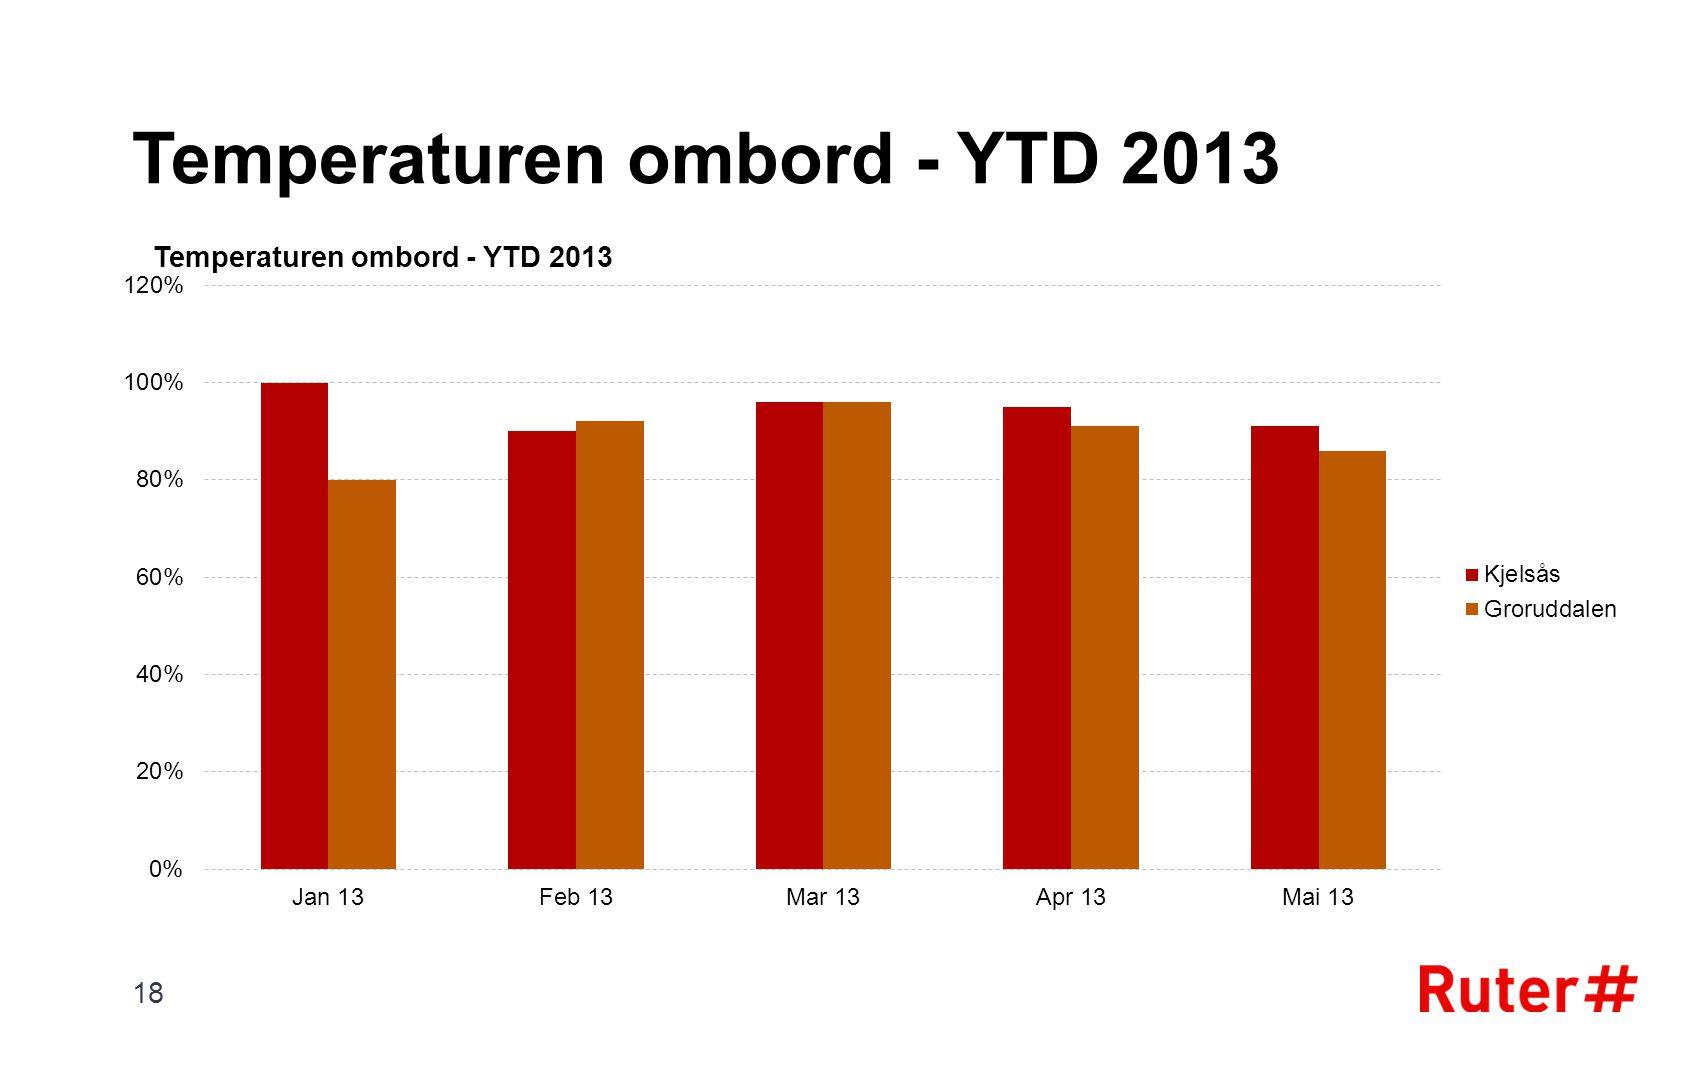 Temperaturen ombord - YTD 2013